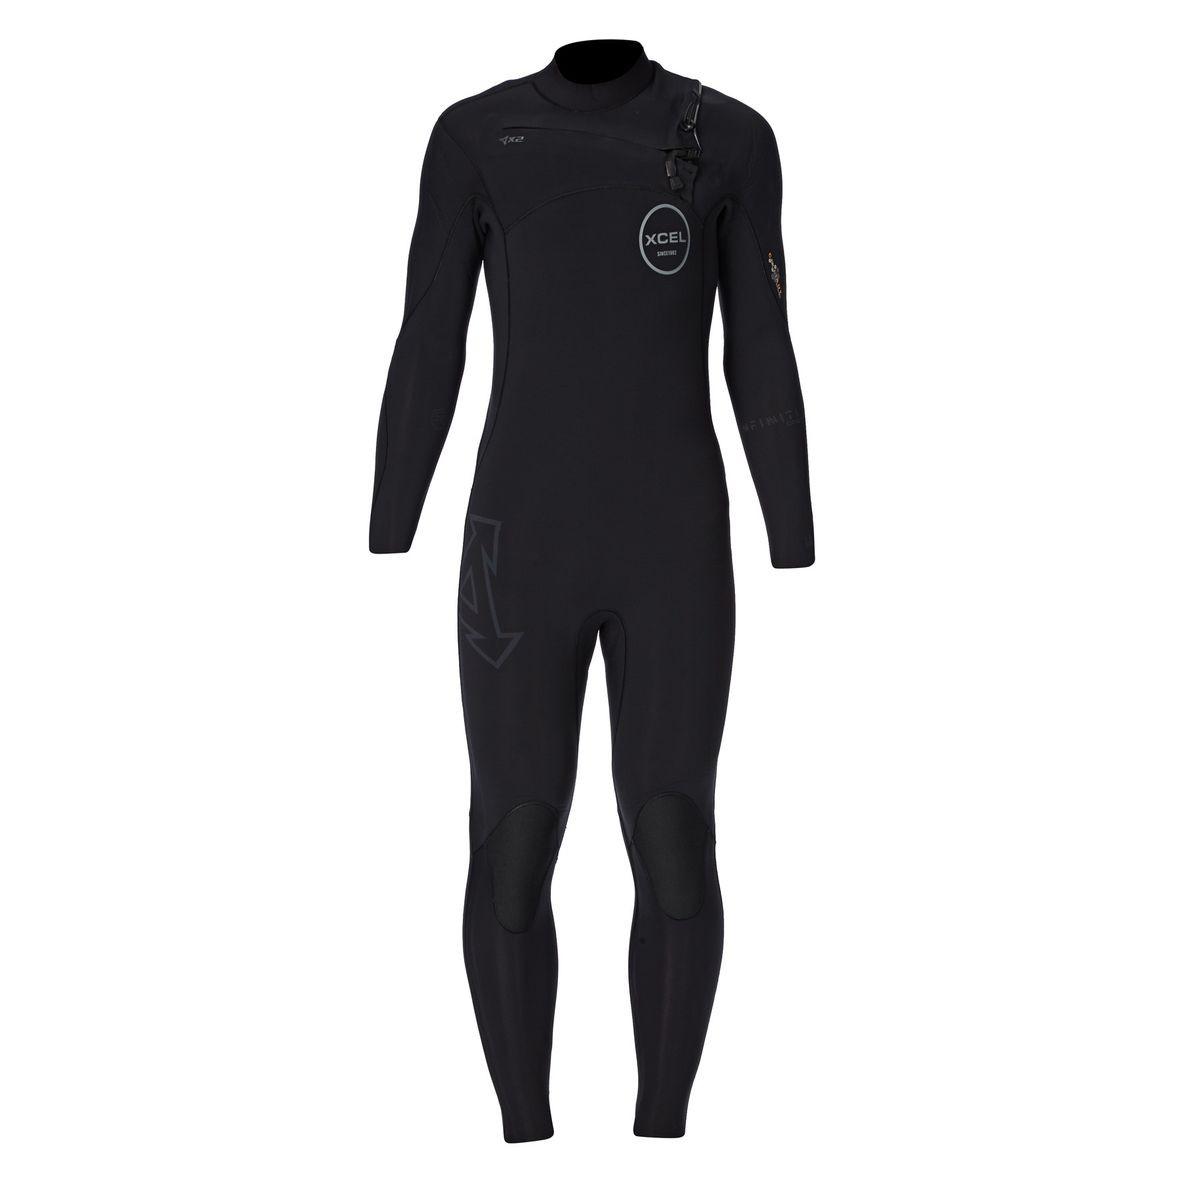 Xcel Infiniti Comp Pro 5mm Chest Zip Wetsuit - Black